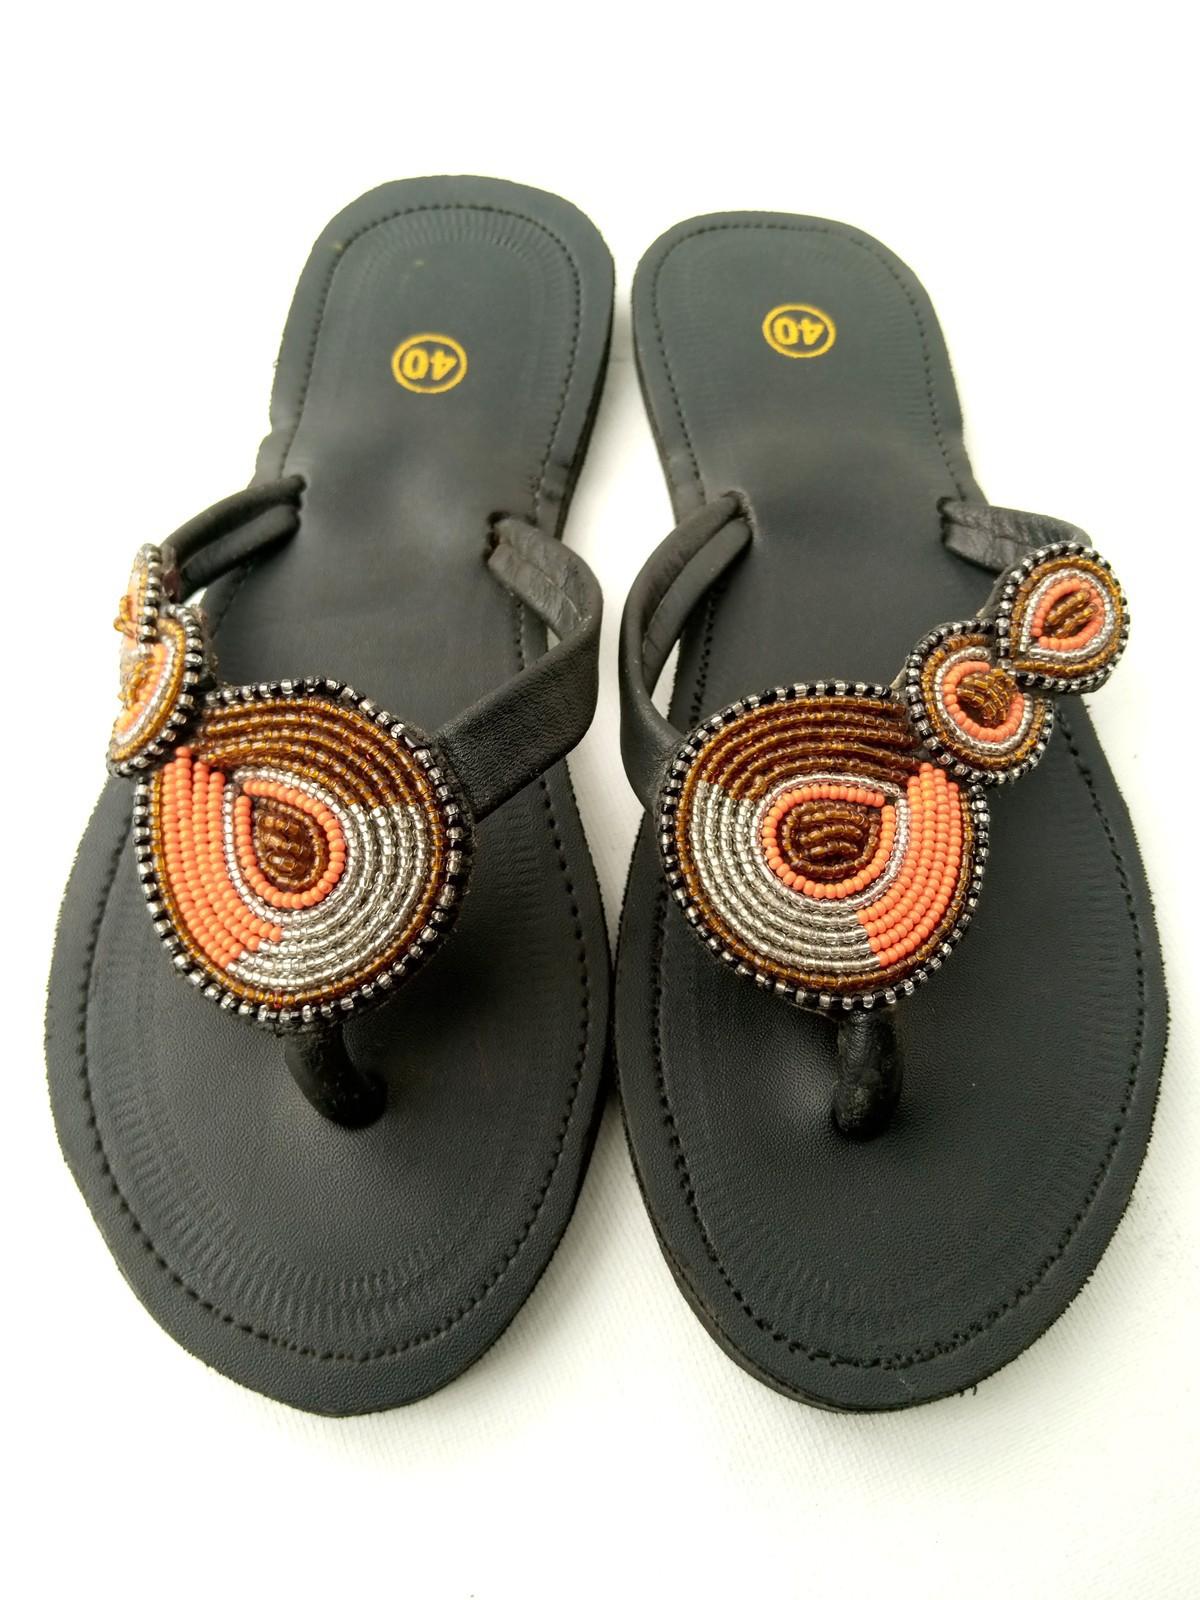 maasai sandals  unisex sandals  tribal sandals  african sandals